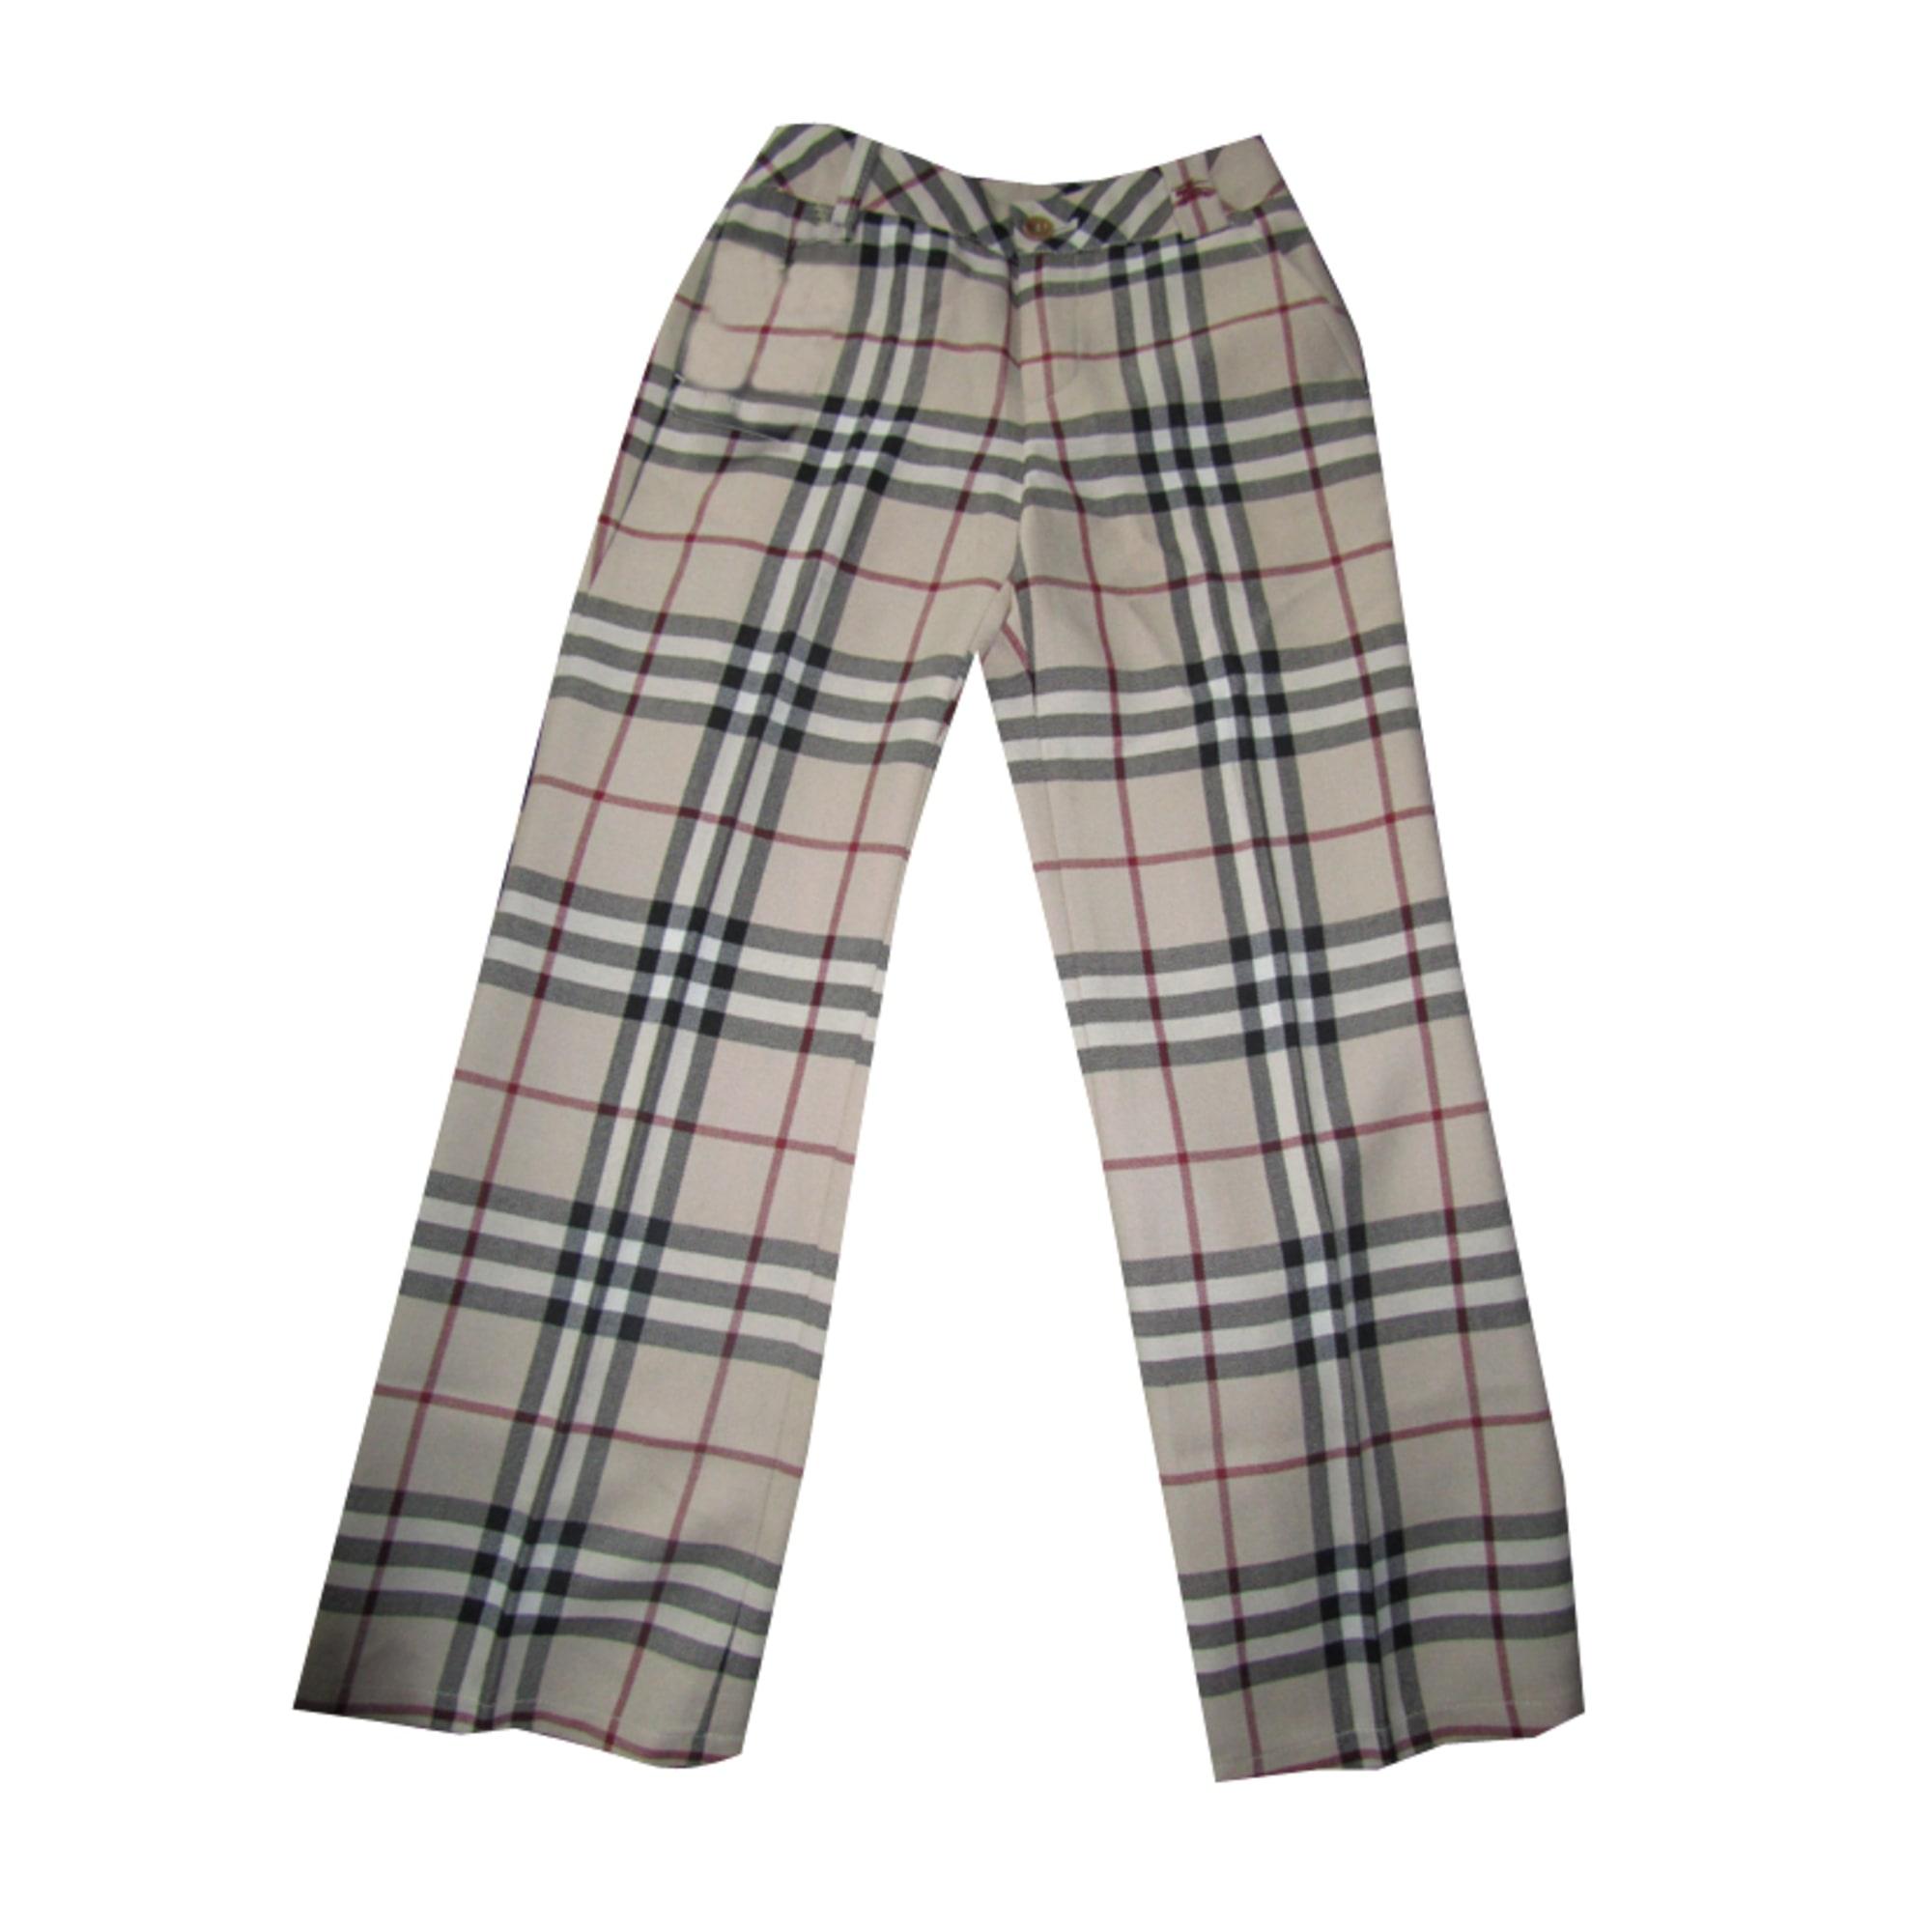 pantalon homme burberry